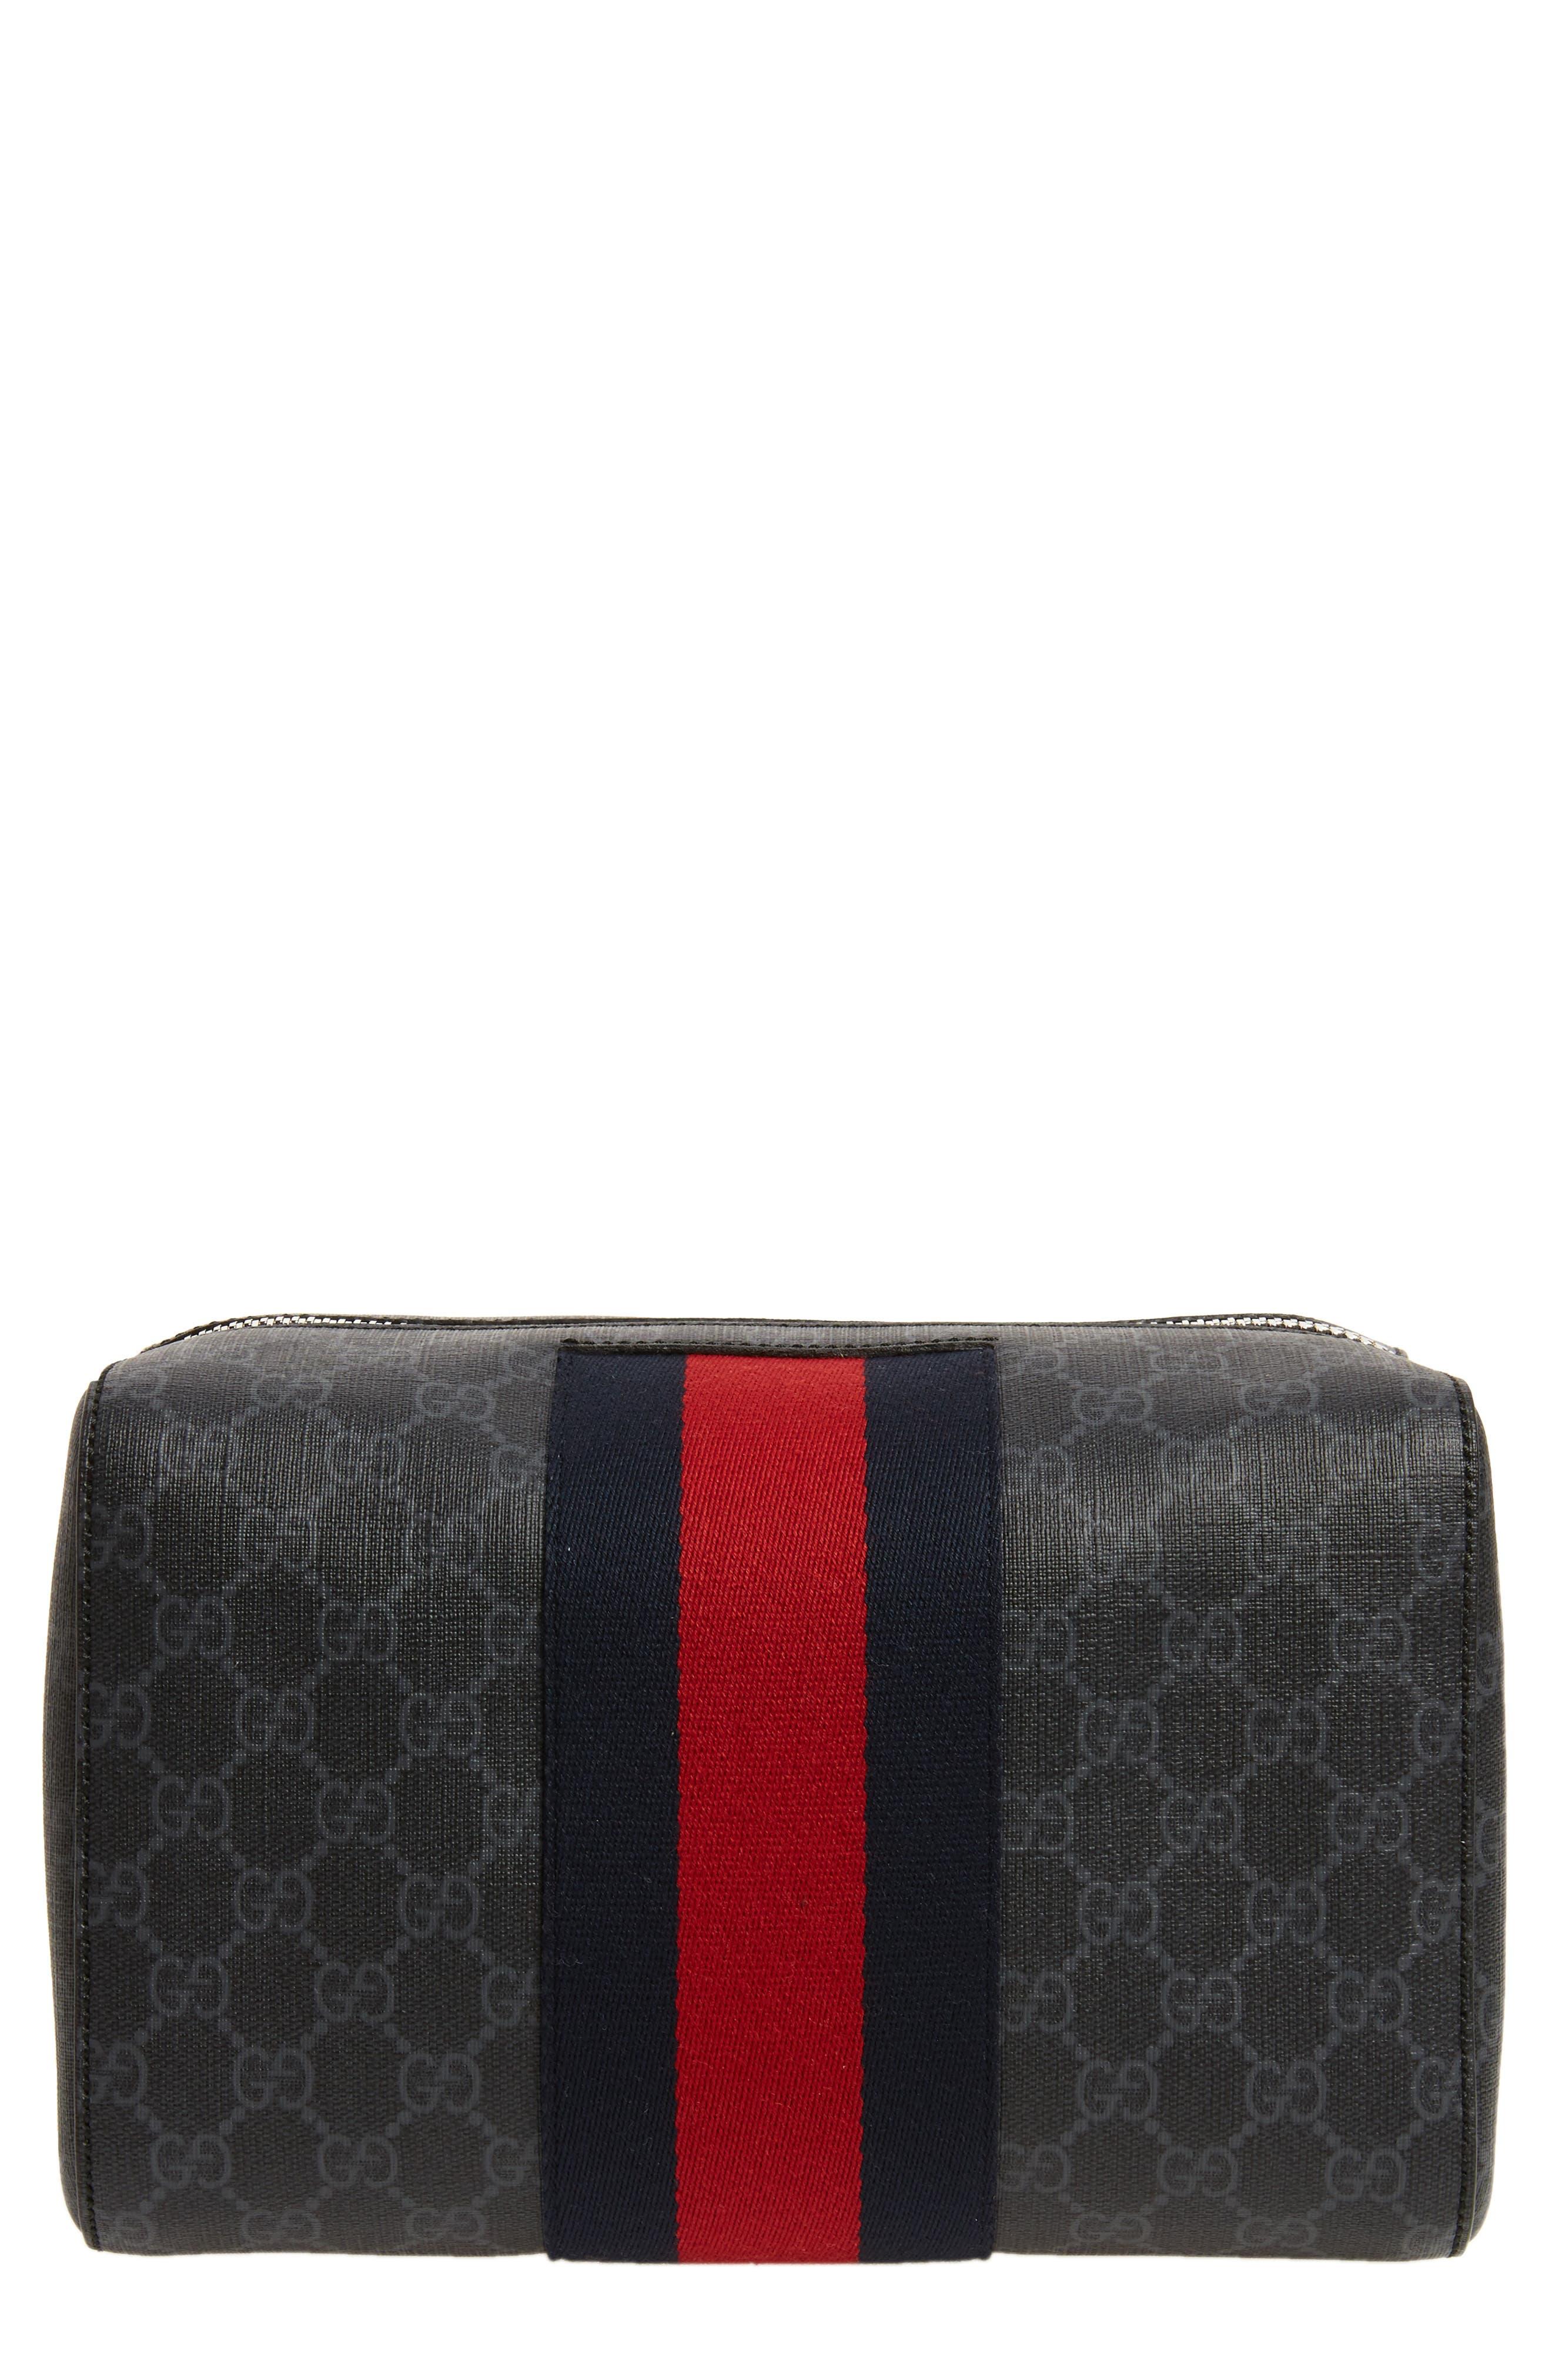 GG Supreme Hand Duffel Bag,                         Main,                         color, 001